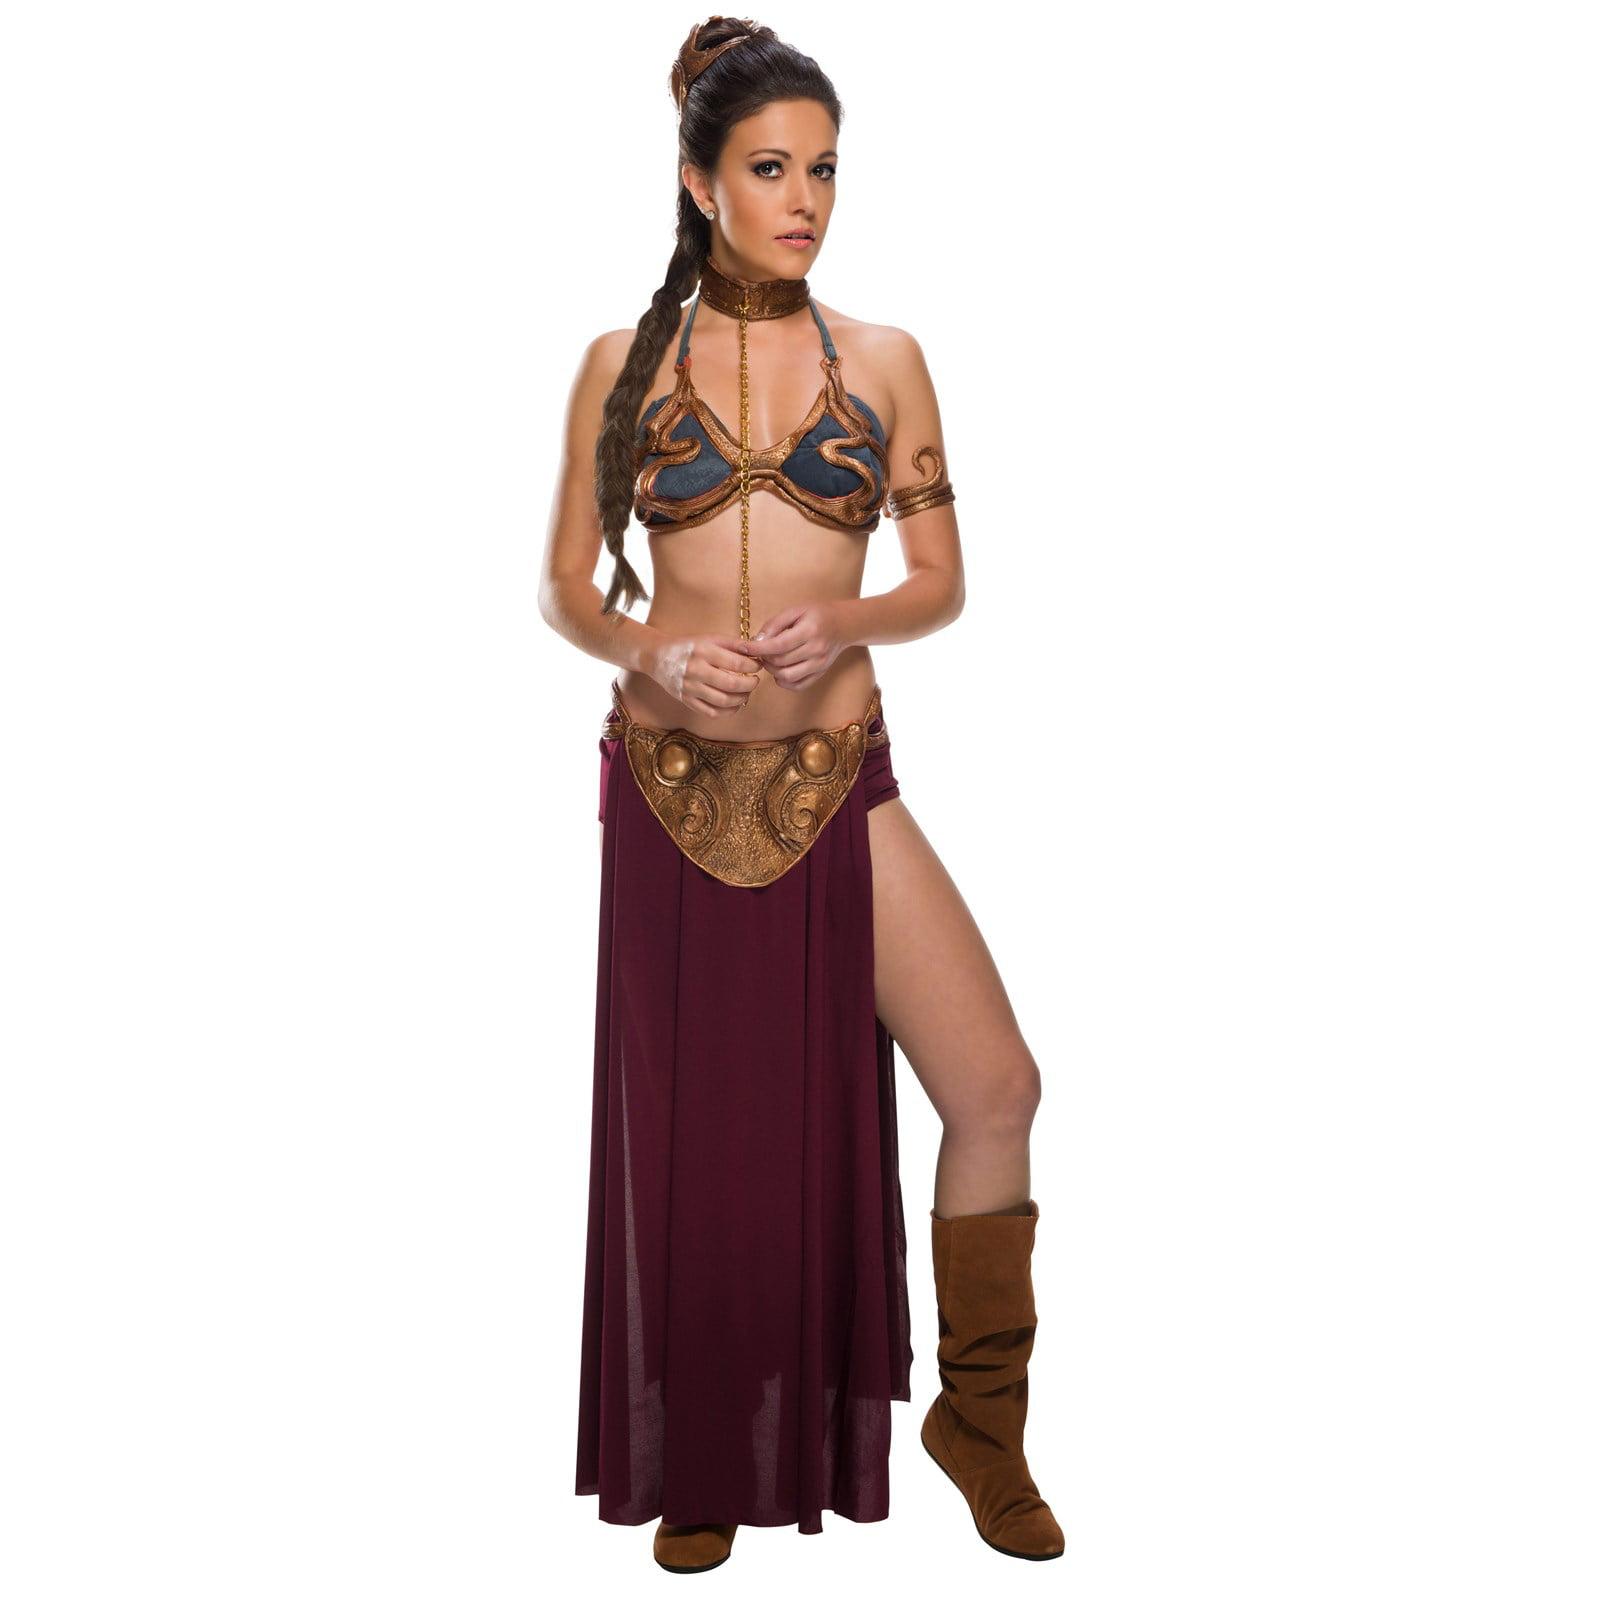 Princess Leia Costume For Halloween